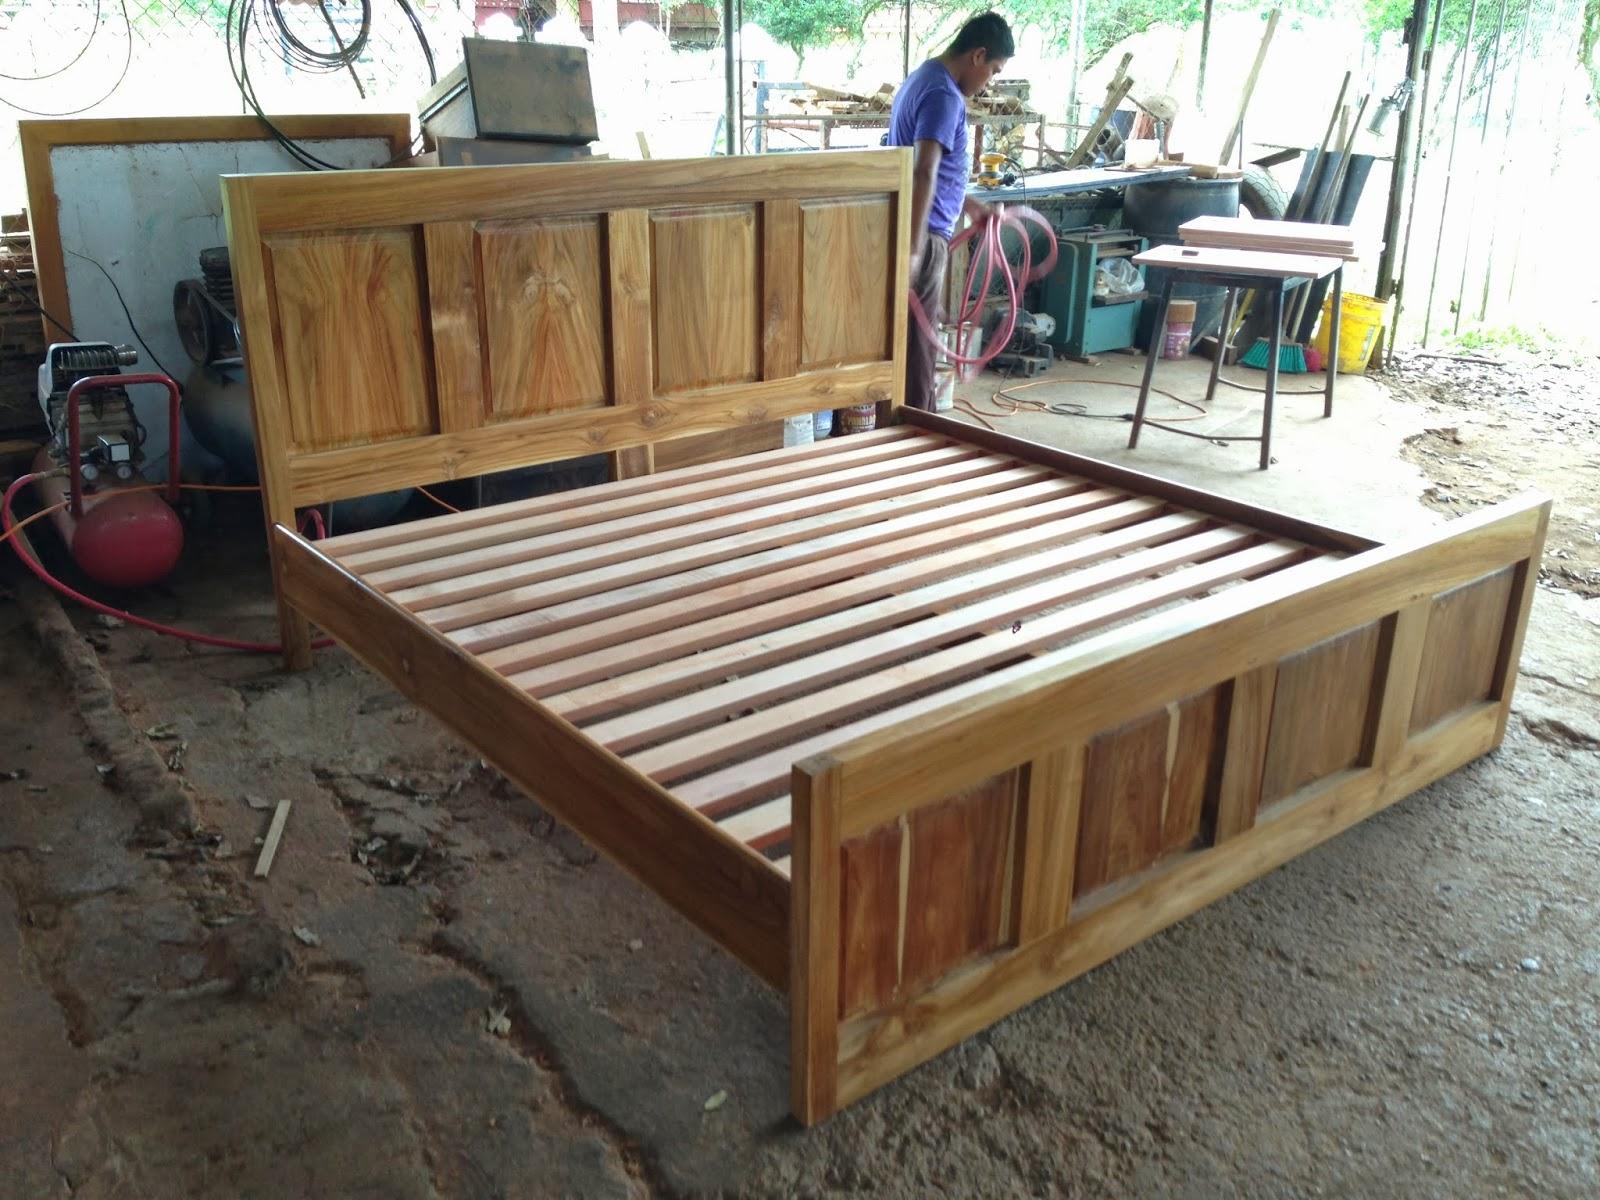 Muebles De Madera De Teca Interesting En Madera De Teca Con  # Muebles Teca Interior